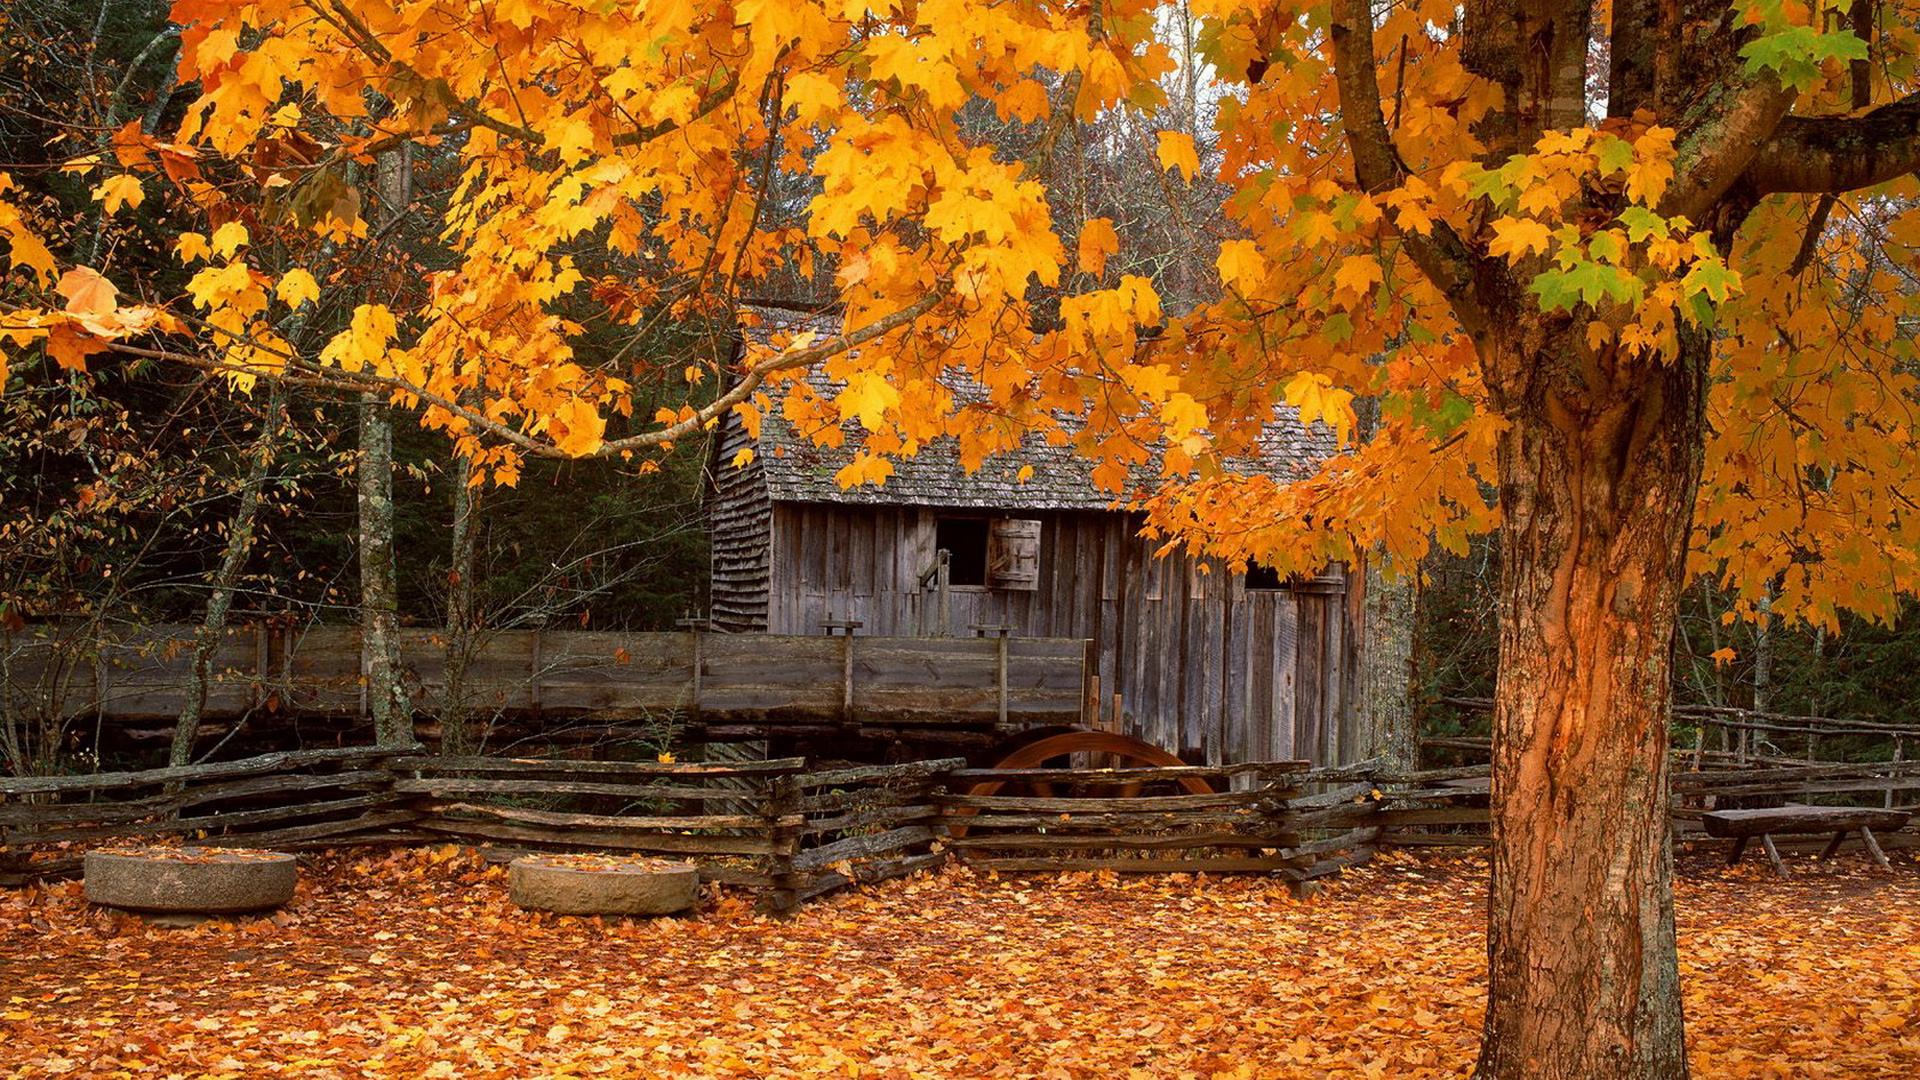 autumn wallpaper 13843